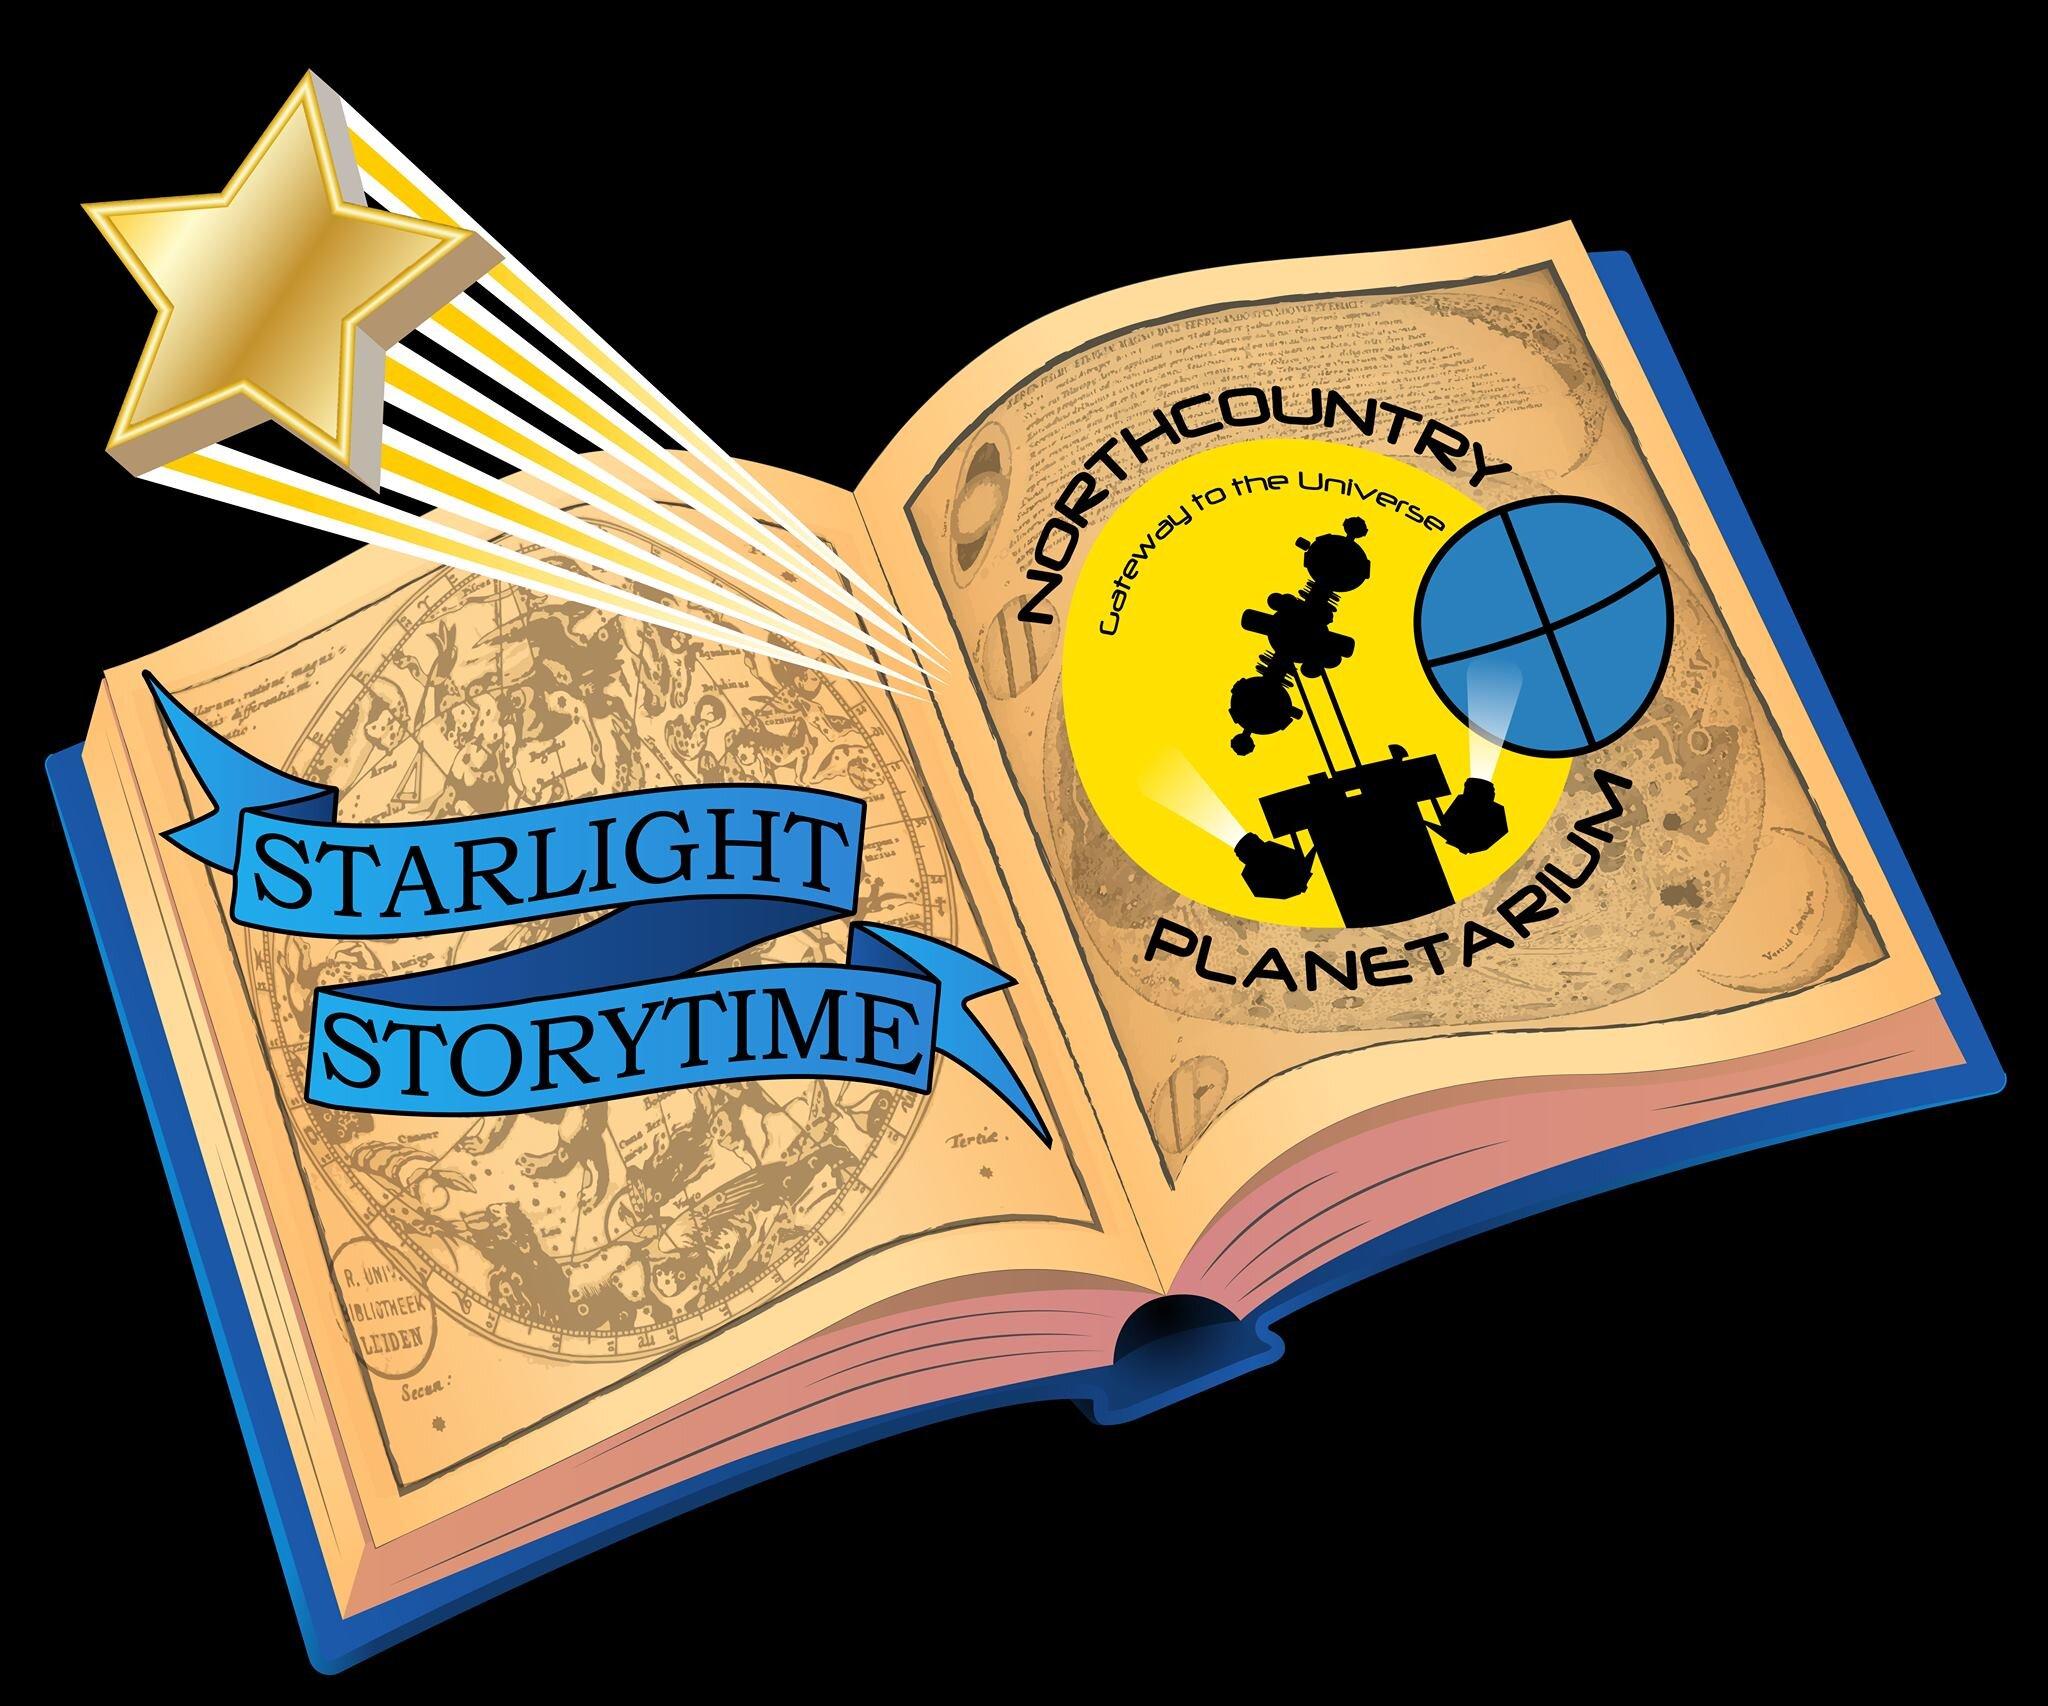 starlight story time.jpg